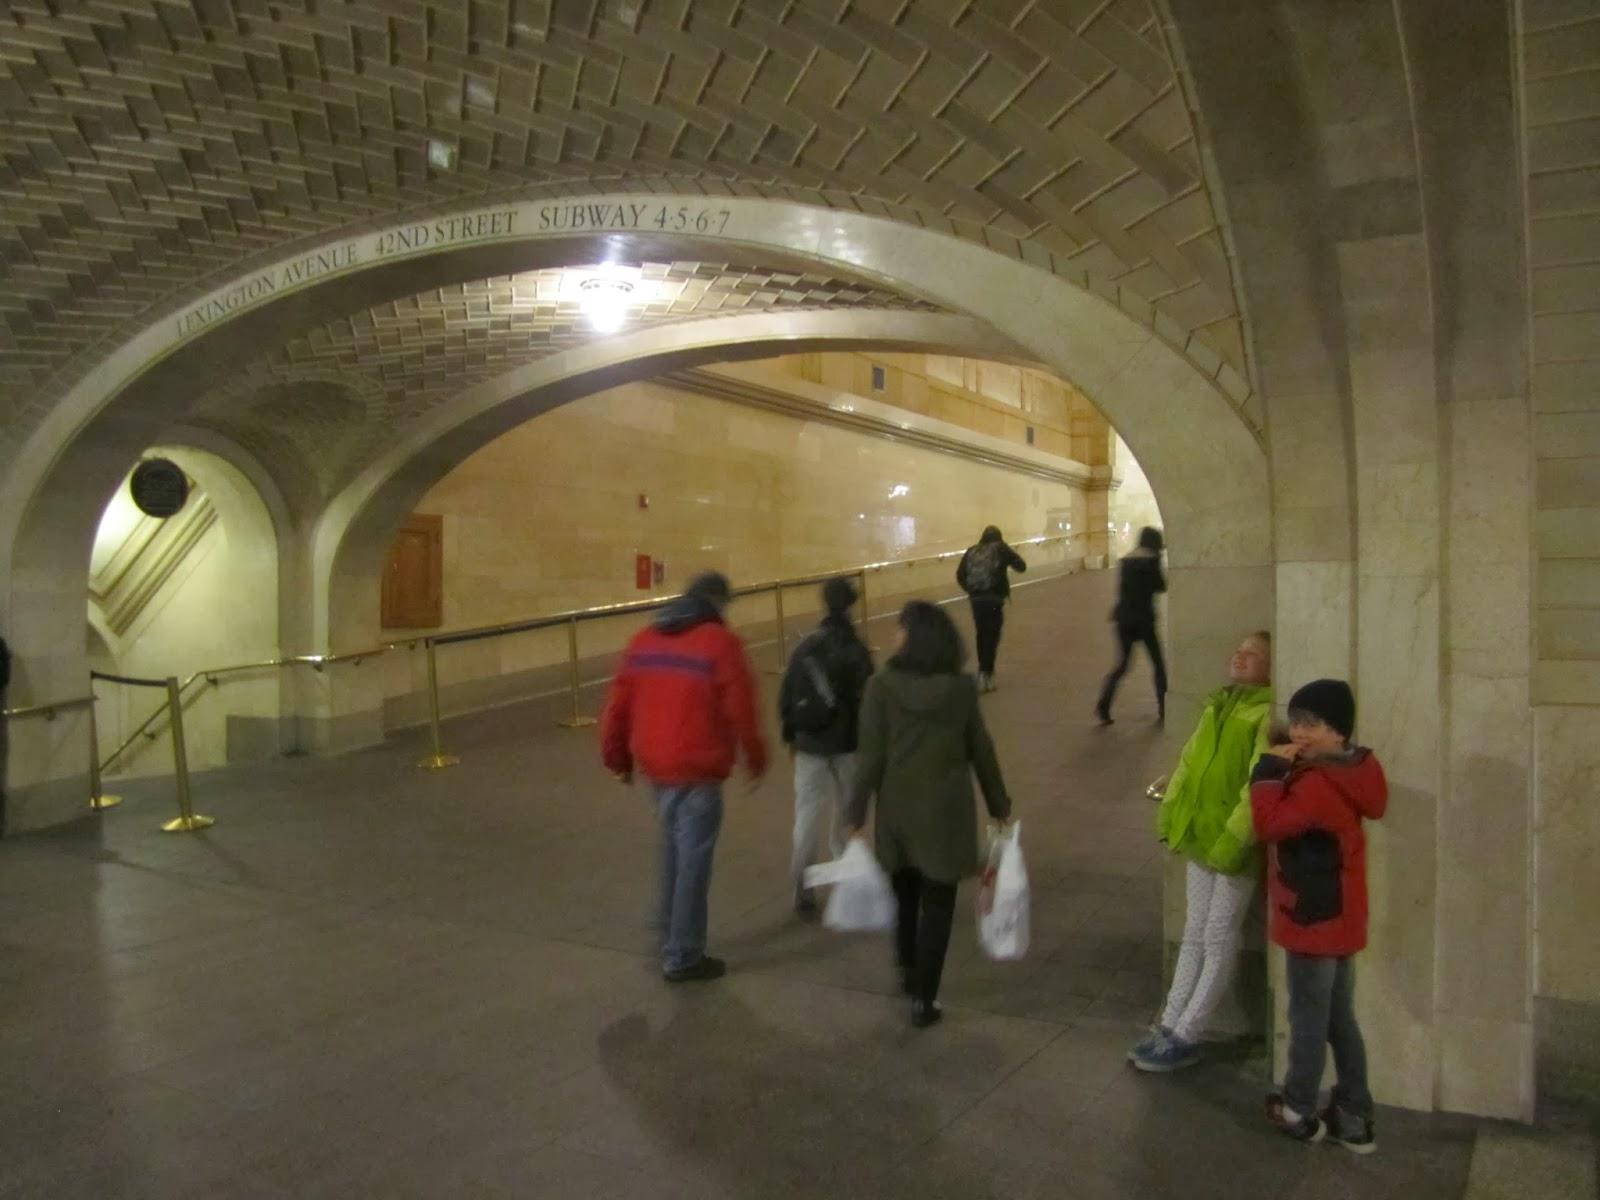 new york city, subway station, kids